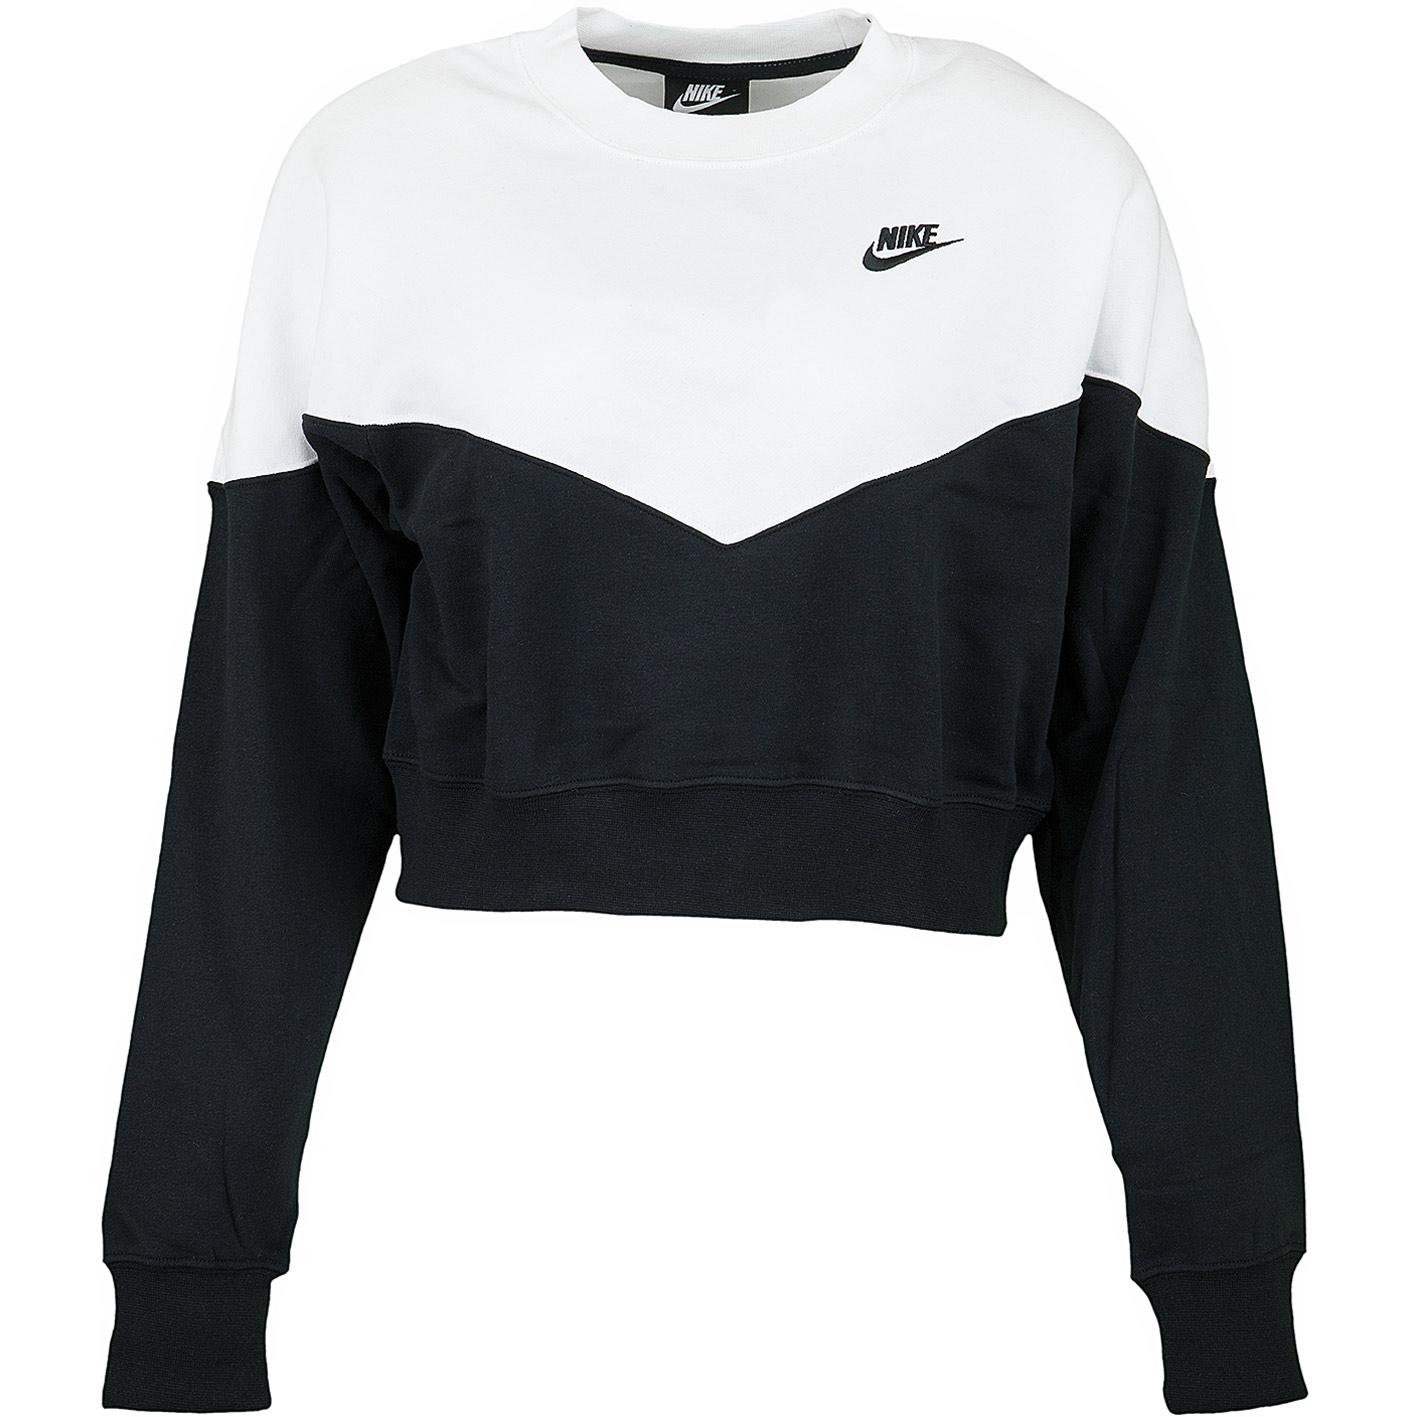 meet 2bc8e aee39 Nike Damen Sweatshirt Heritage Fleece schwarz/weiß